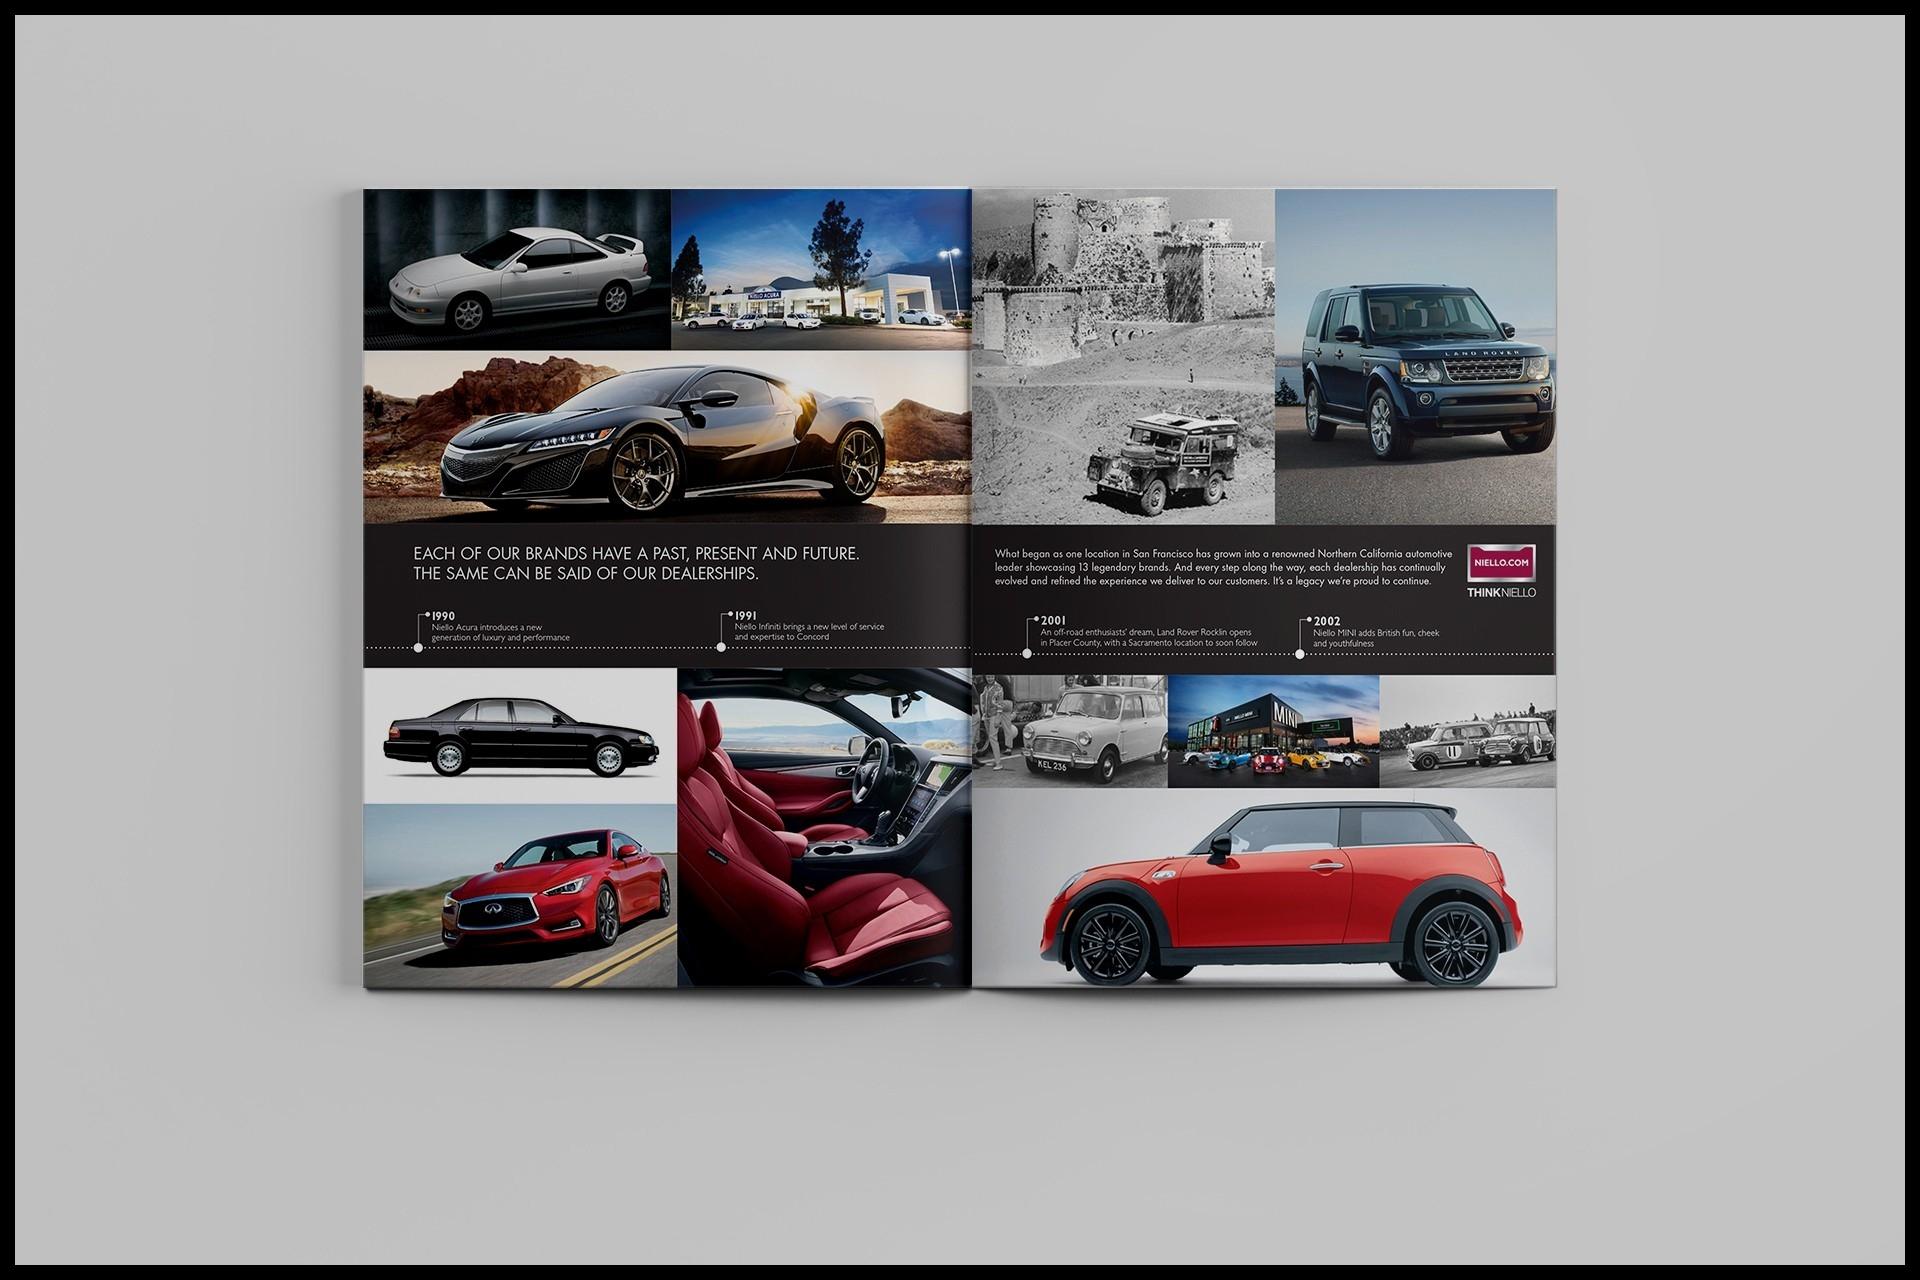 Acura Service Stunning Acura Sacramento the Best the Niello Pany – Fongrific